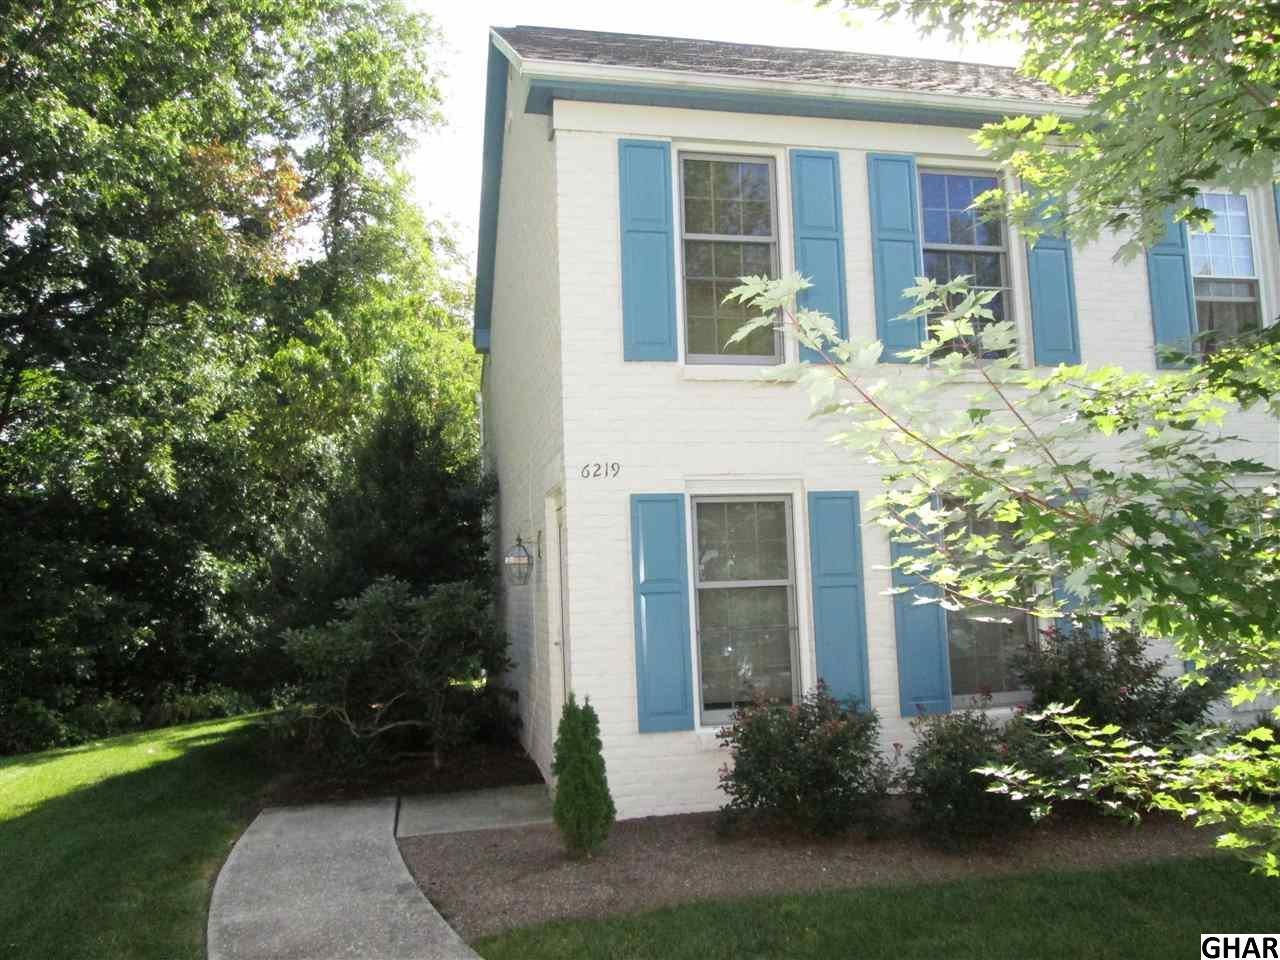 Rental Homes for Rent, ListingId:35105520, location: 6219 Stanford Ct Mechanicsburg 17055